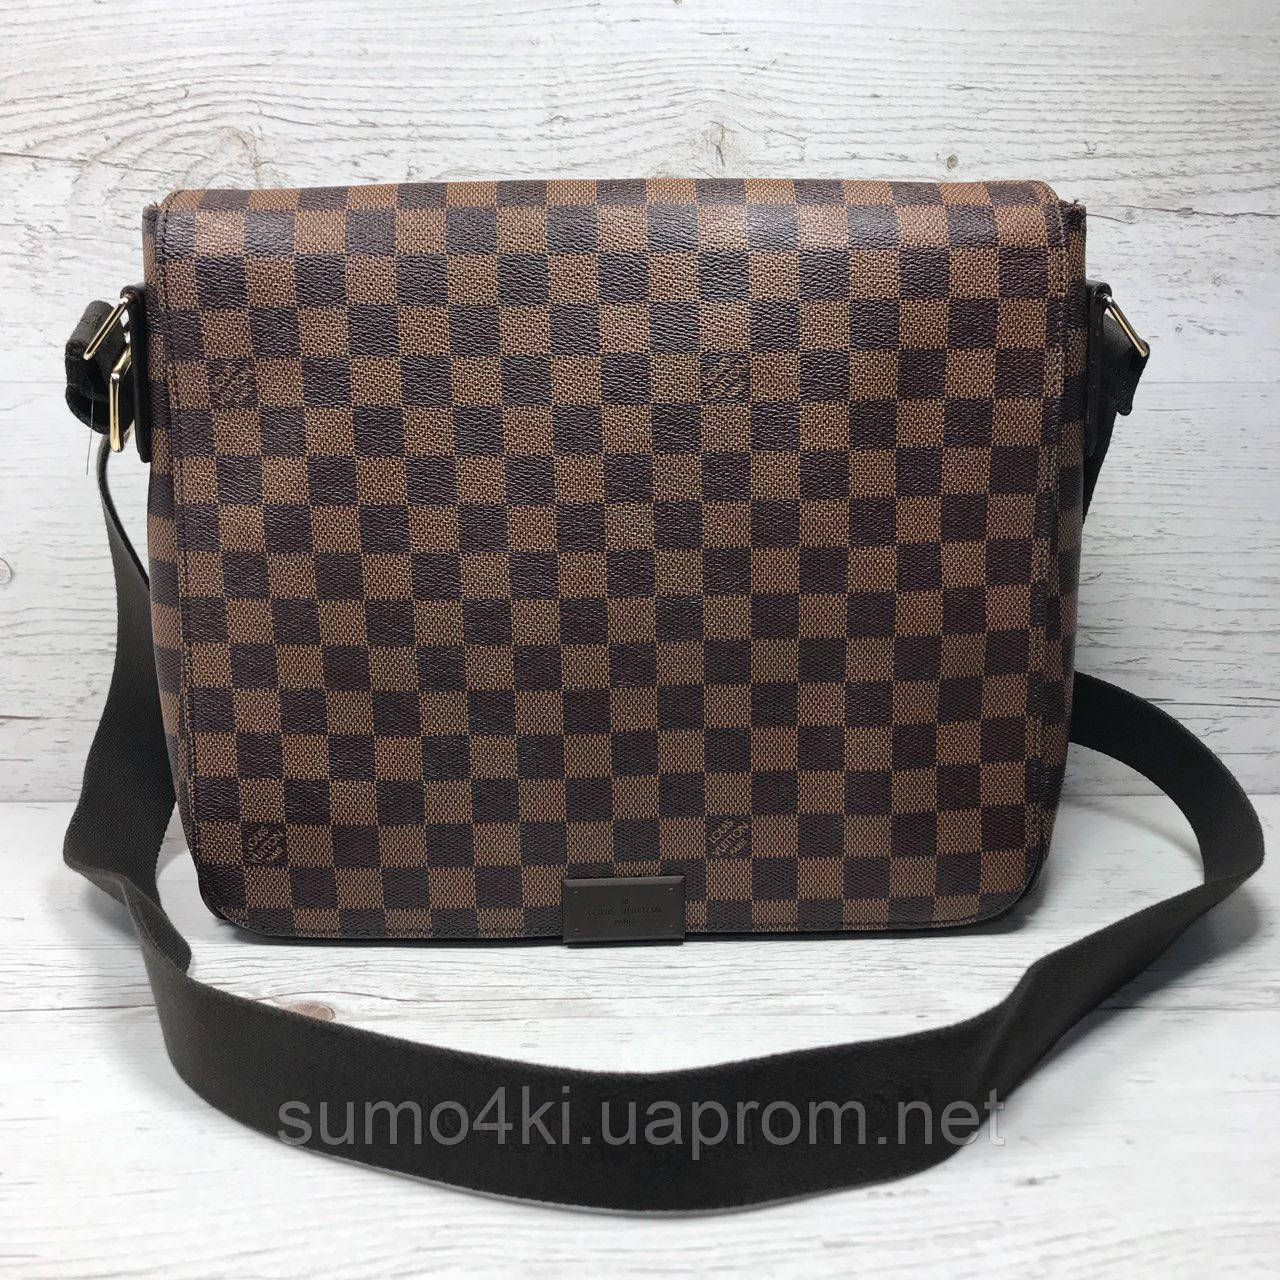 ef4d603171d6 Купить Мужскую сумку планшет через плечо Louis Vuitton Луи Виттон ...